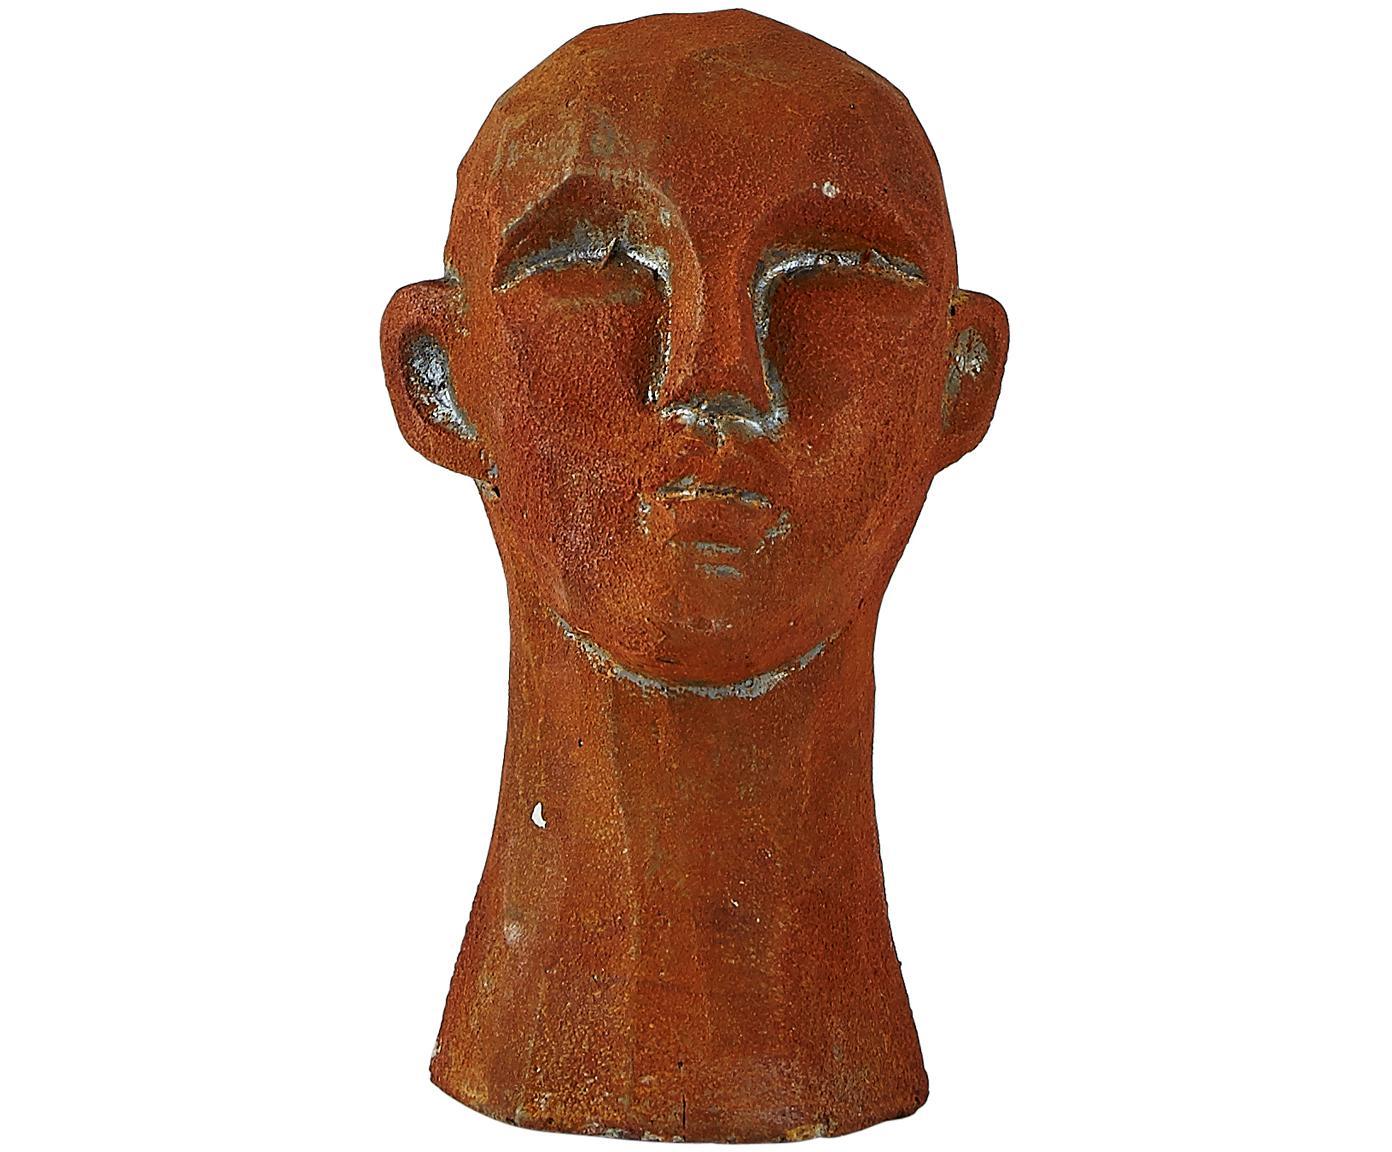 Deko-Objekte-Set Figure Head, 3-tlg., Beton, Weiß, Braun, Grau, Ø 9 x H 15 cm